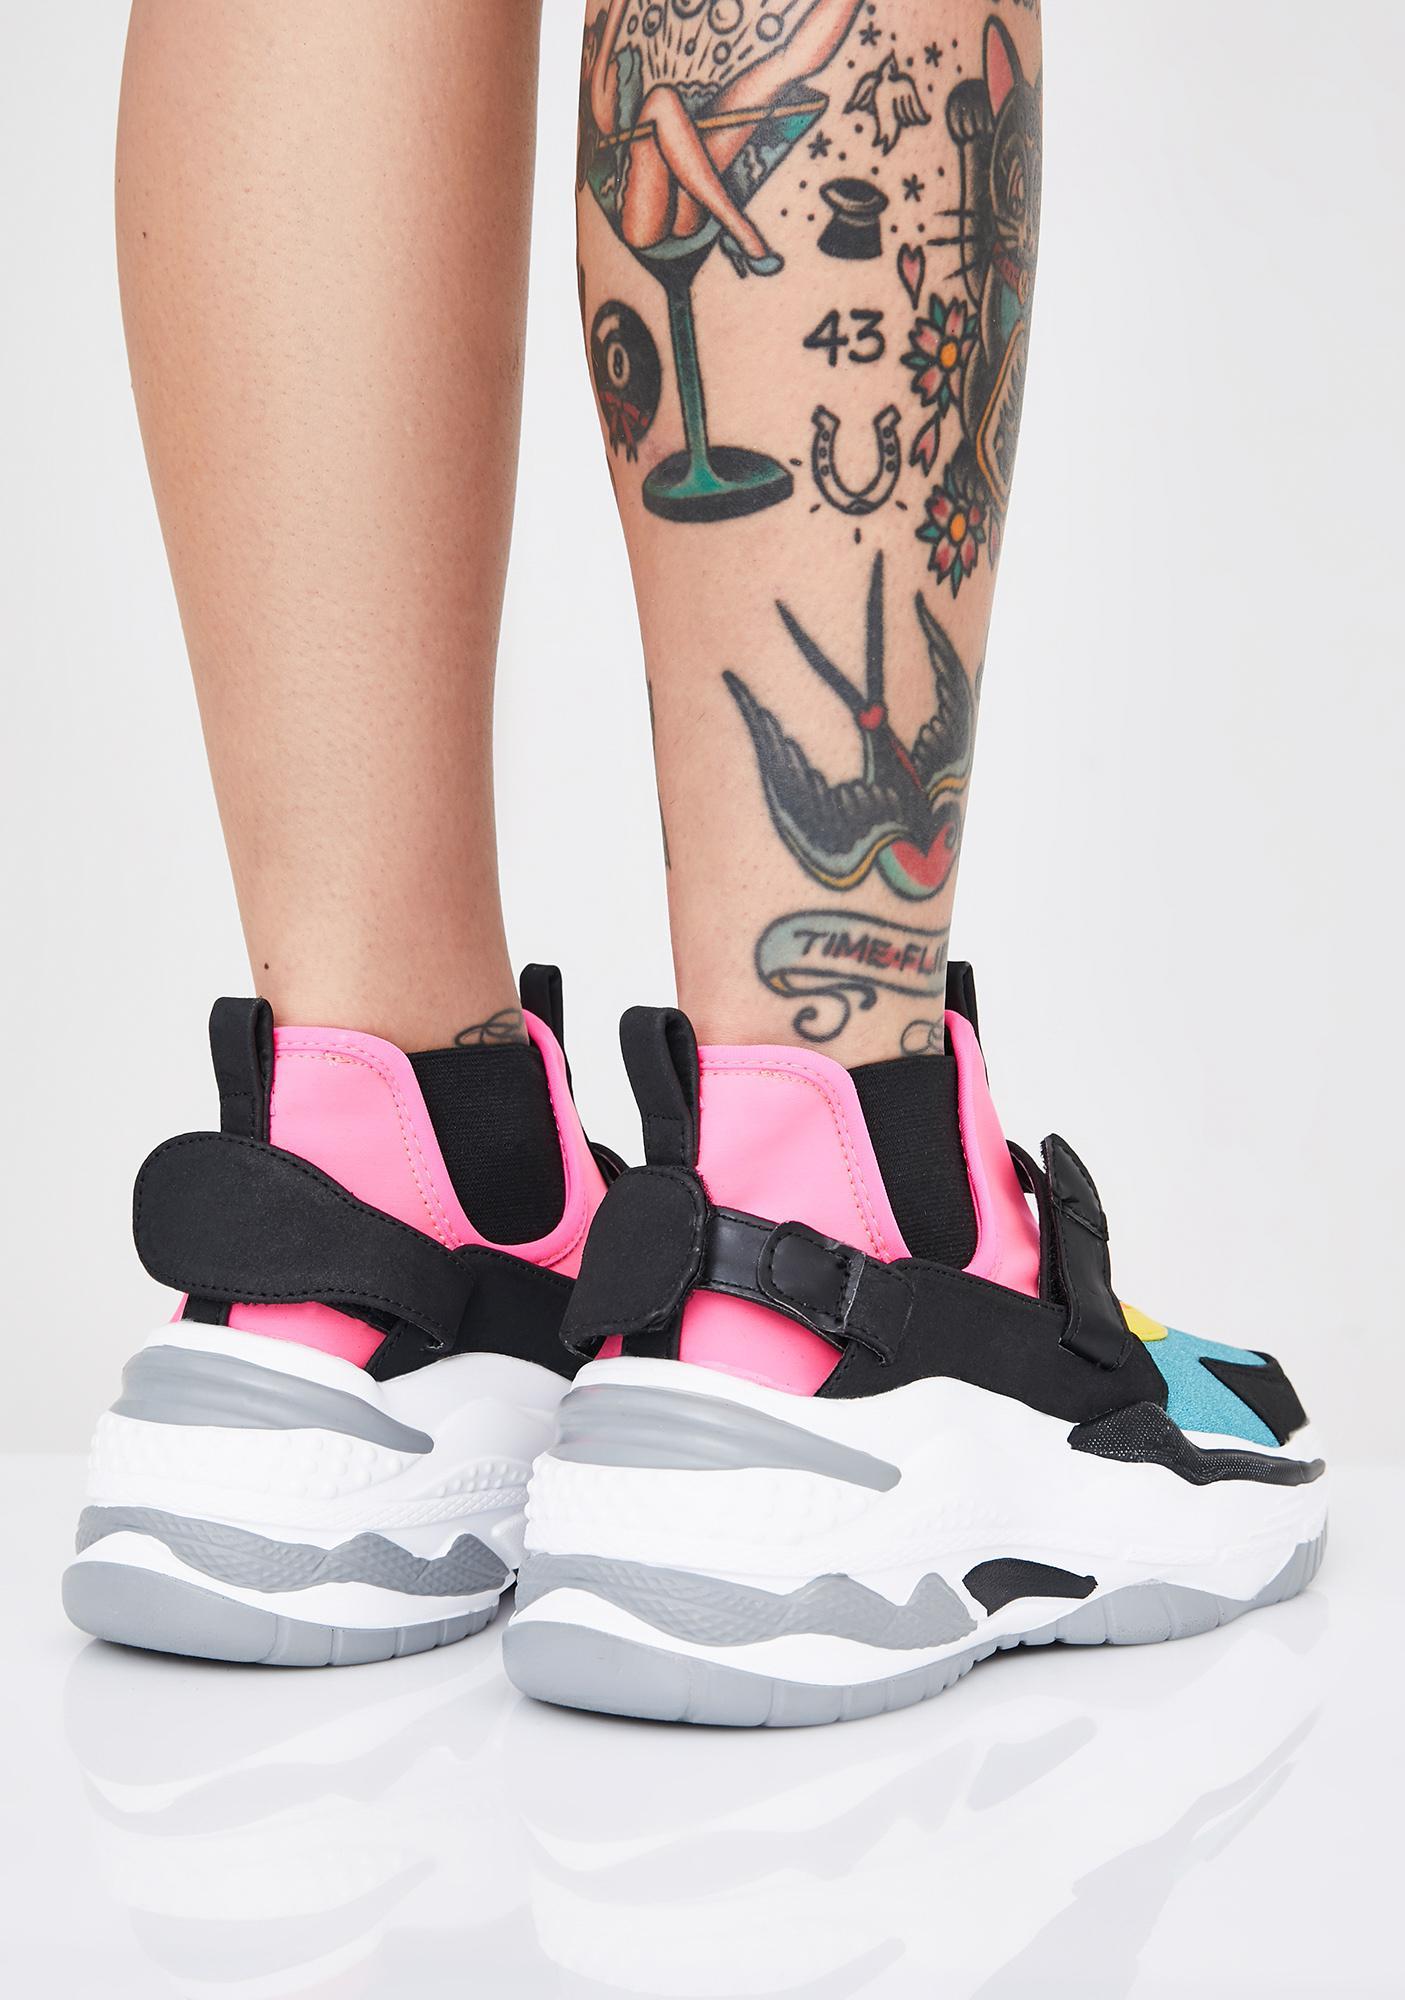 Hype Maniac Chunky Sneakers